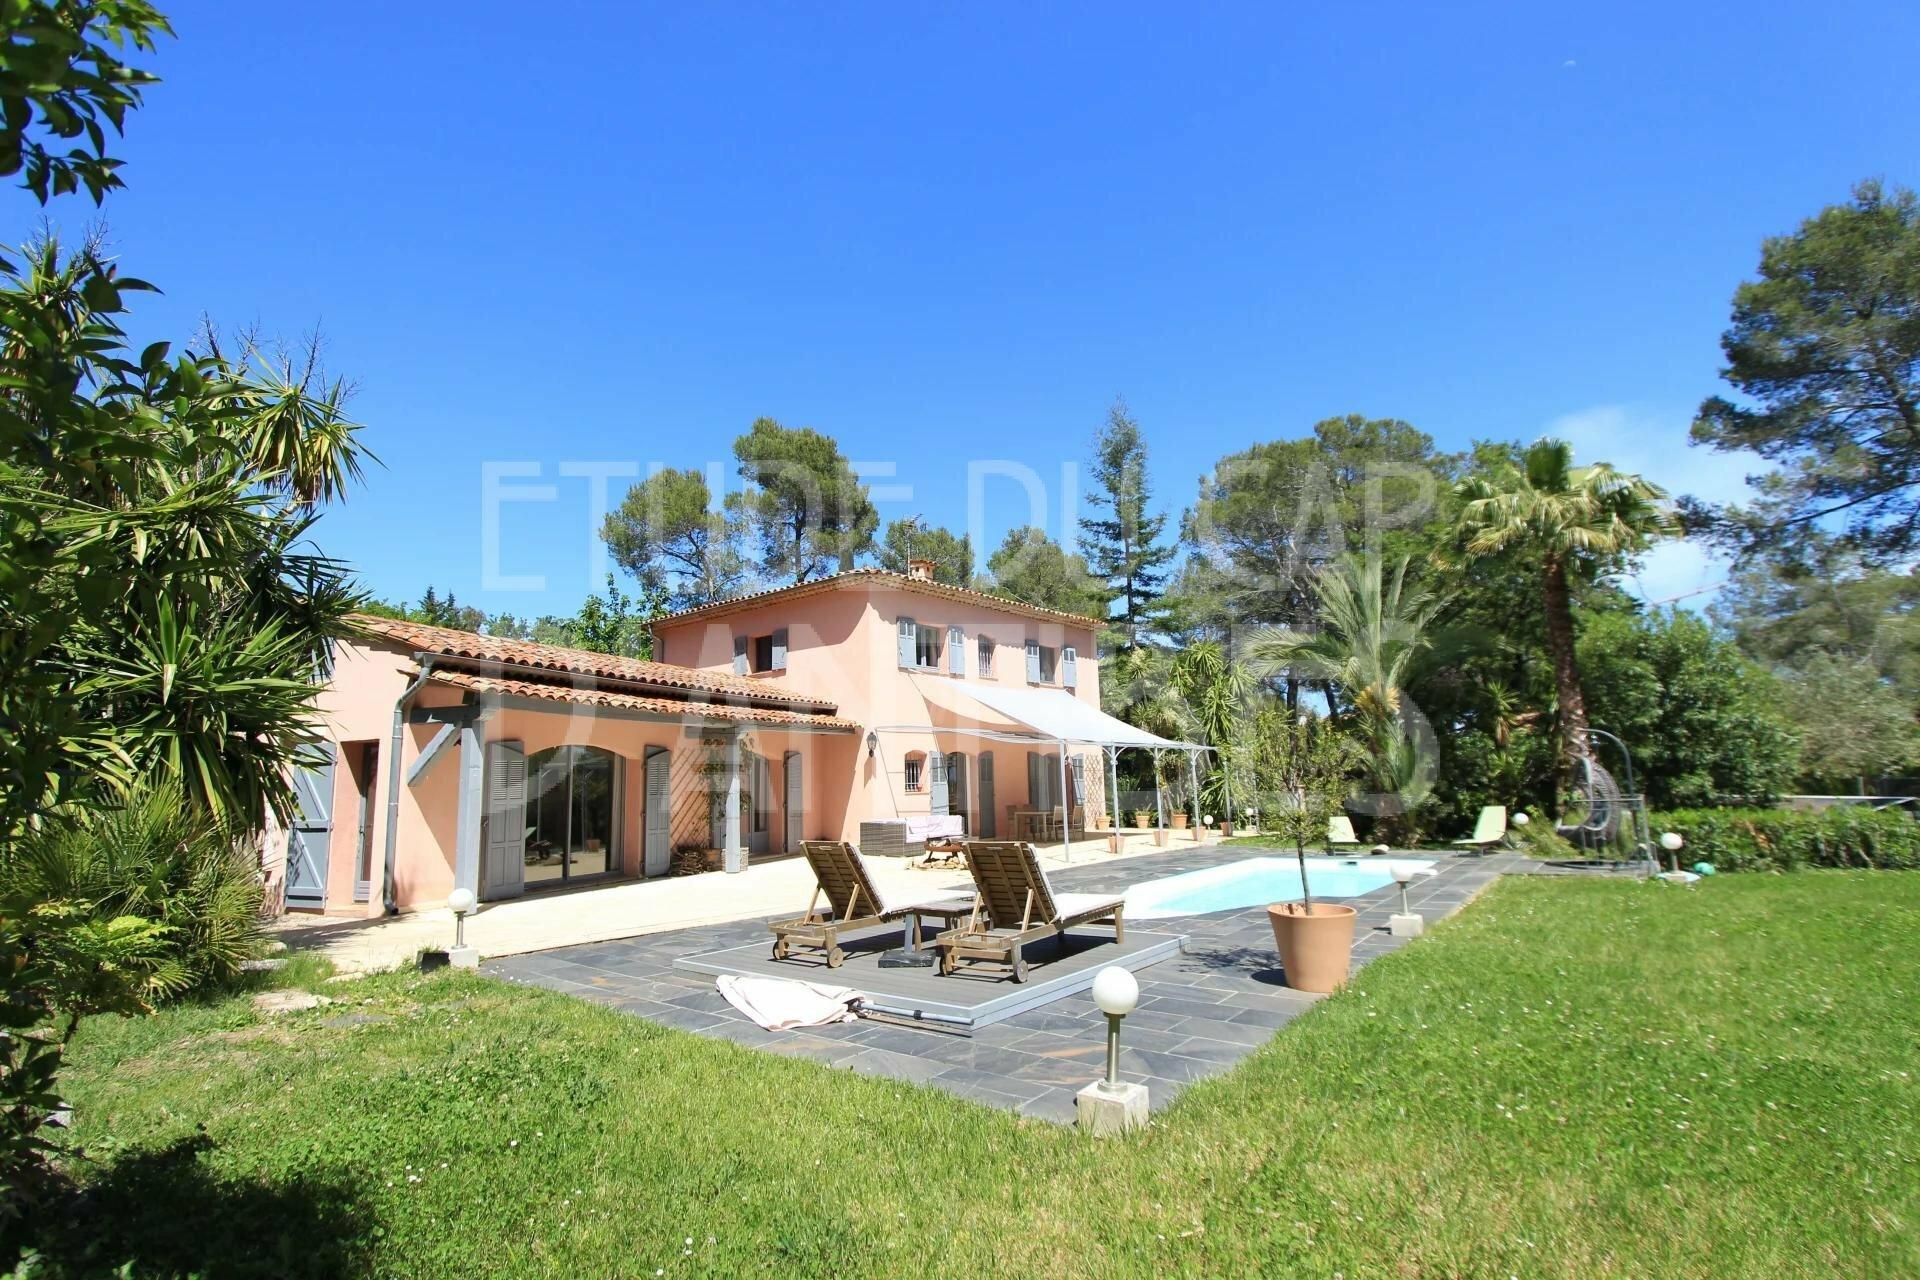 Villa in Mougins, Provence-Alpes-Côte d'Azur, France 1 - 11458901